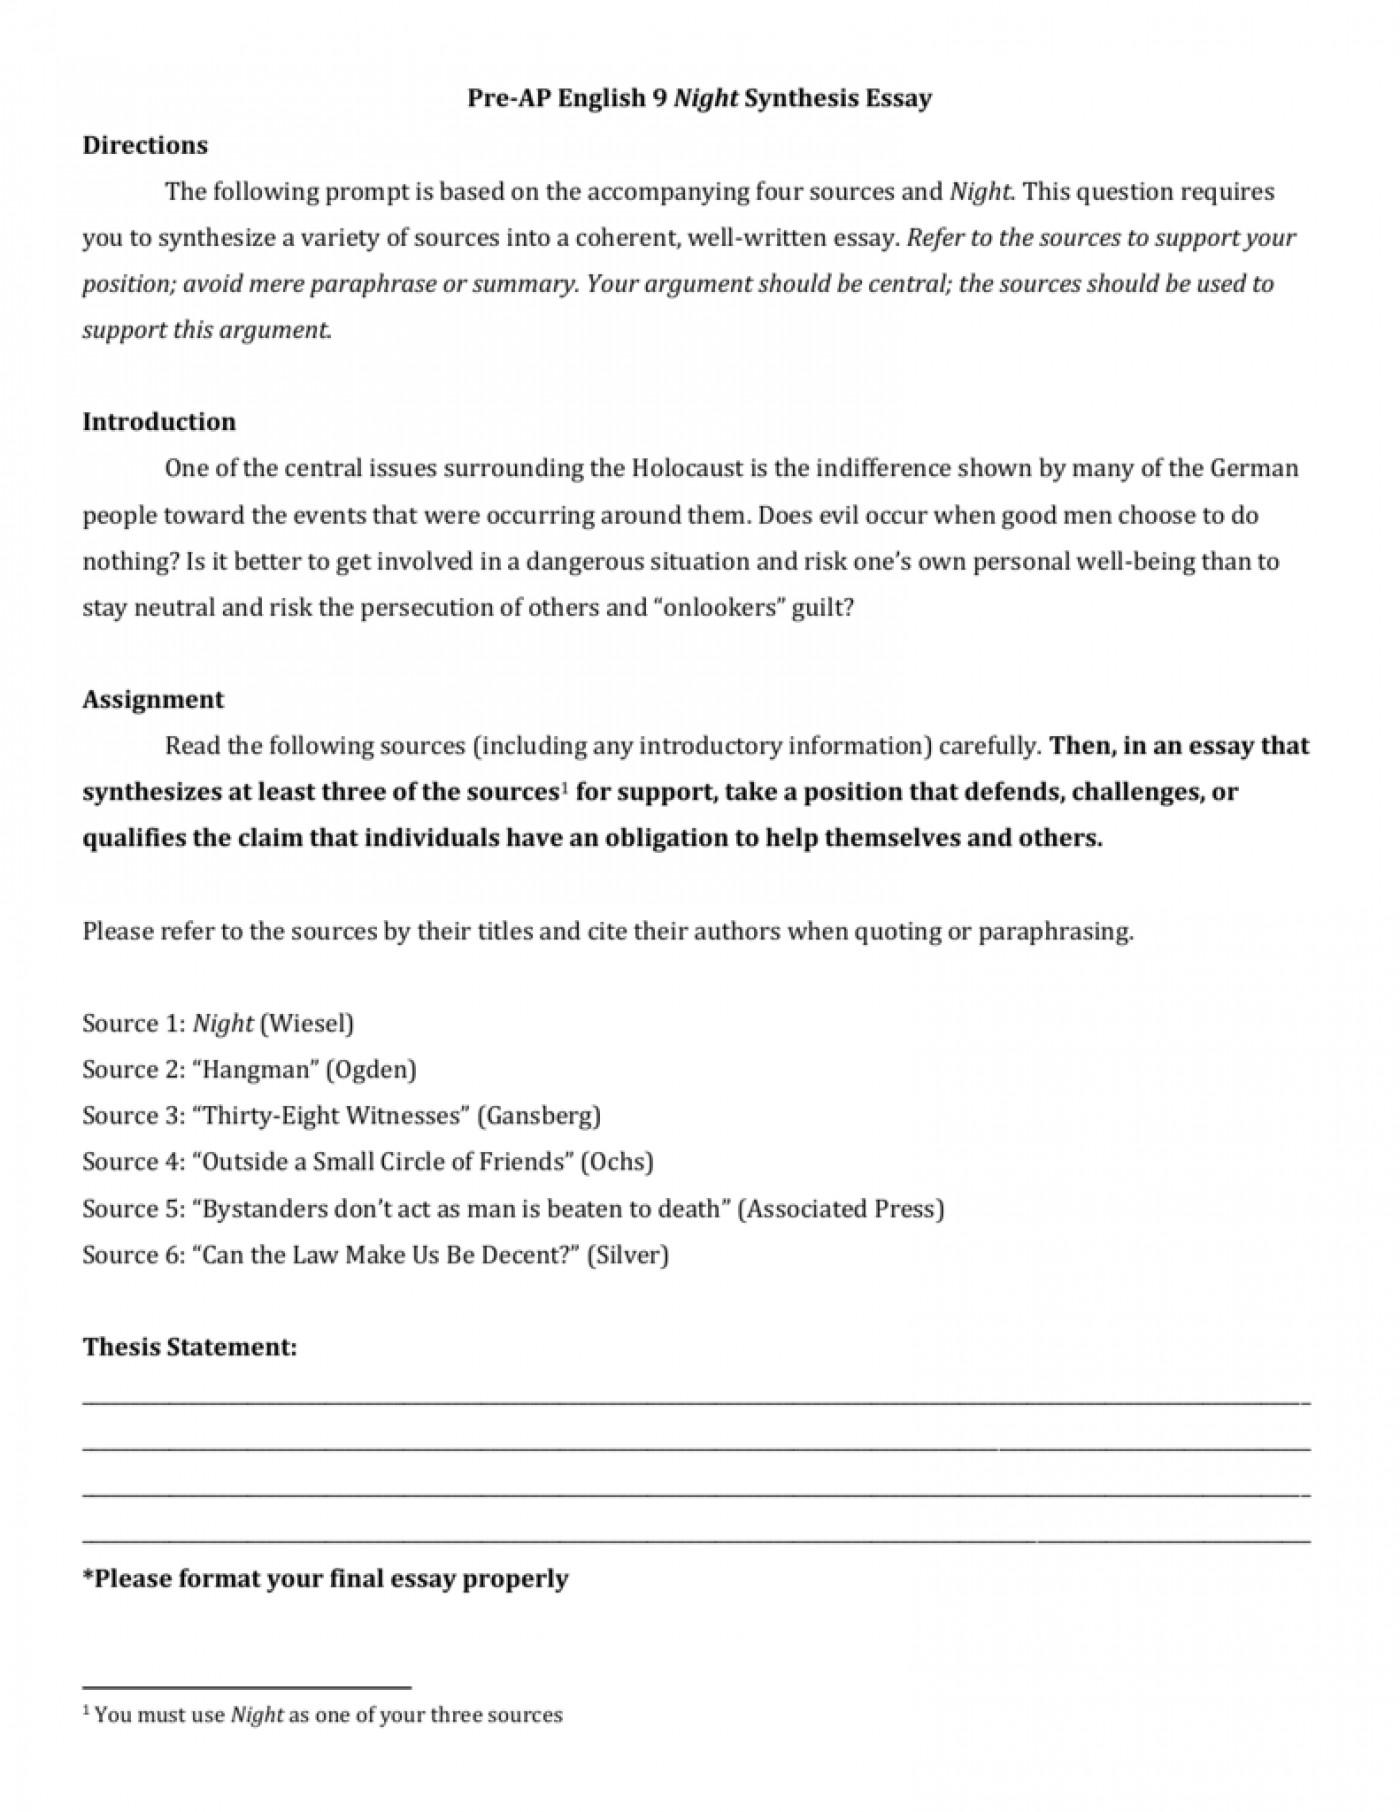 003 006963363 1 Synthesis Essay Sensational Outline Format Ap Lang 1400